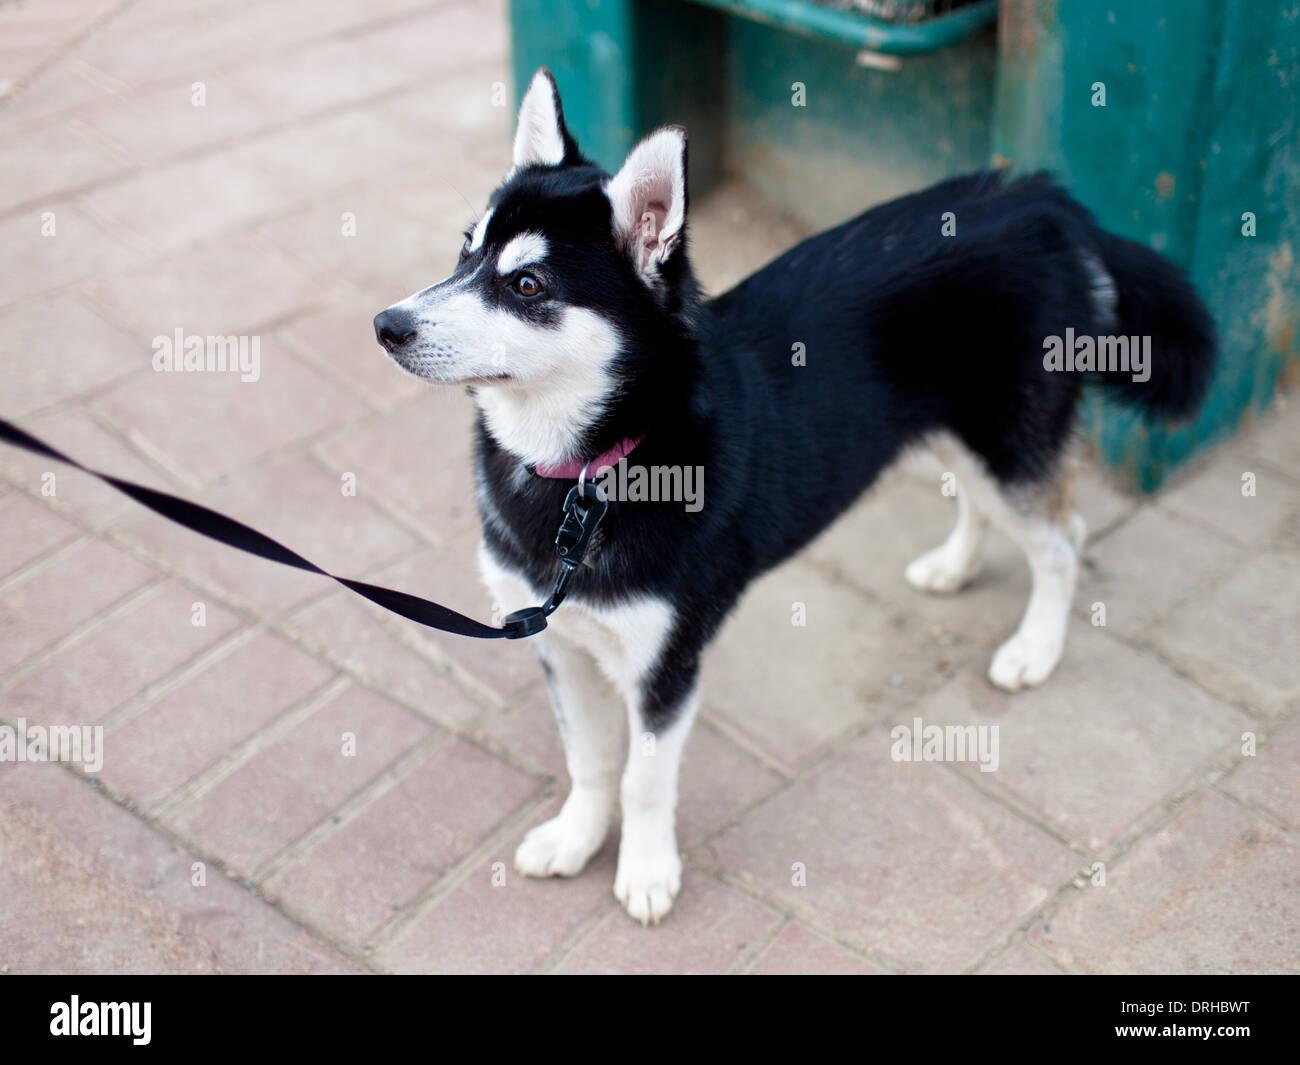 A Cute Miniature Husky Puppy Stock Photo 66150724 Alamy